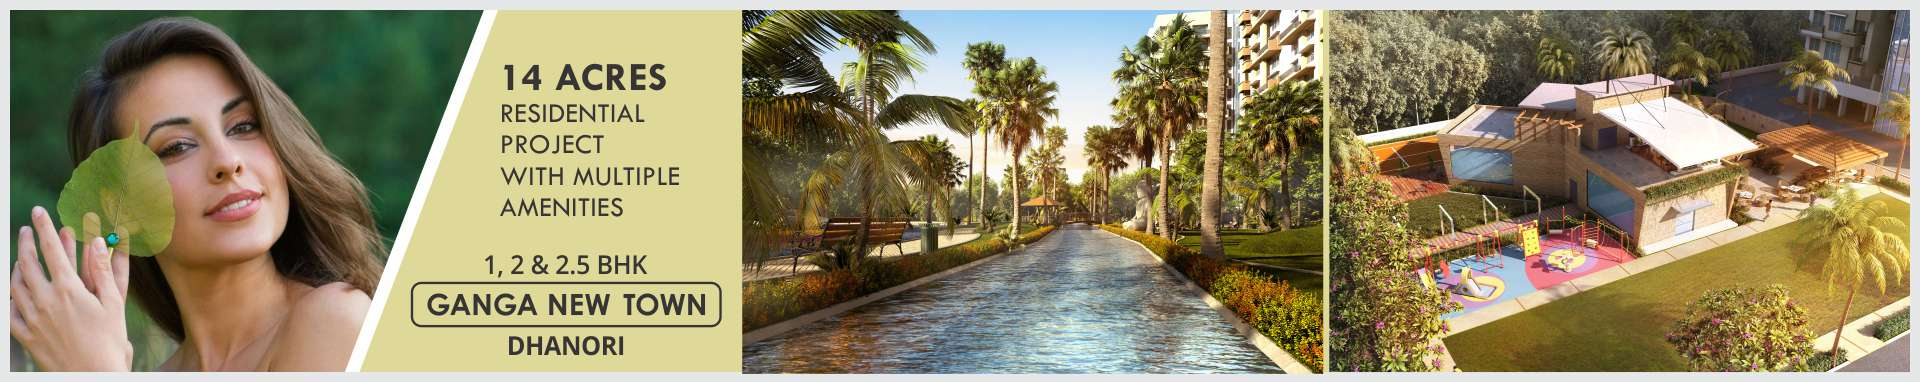 Ganga New Town - 1,2 & 2.5 bhk-property-ad.jpeg